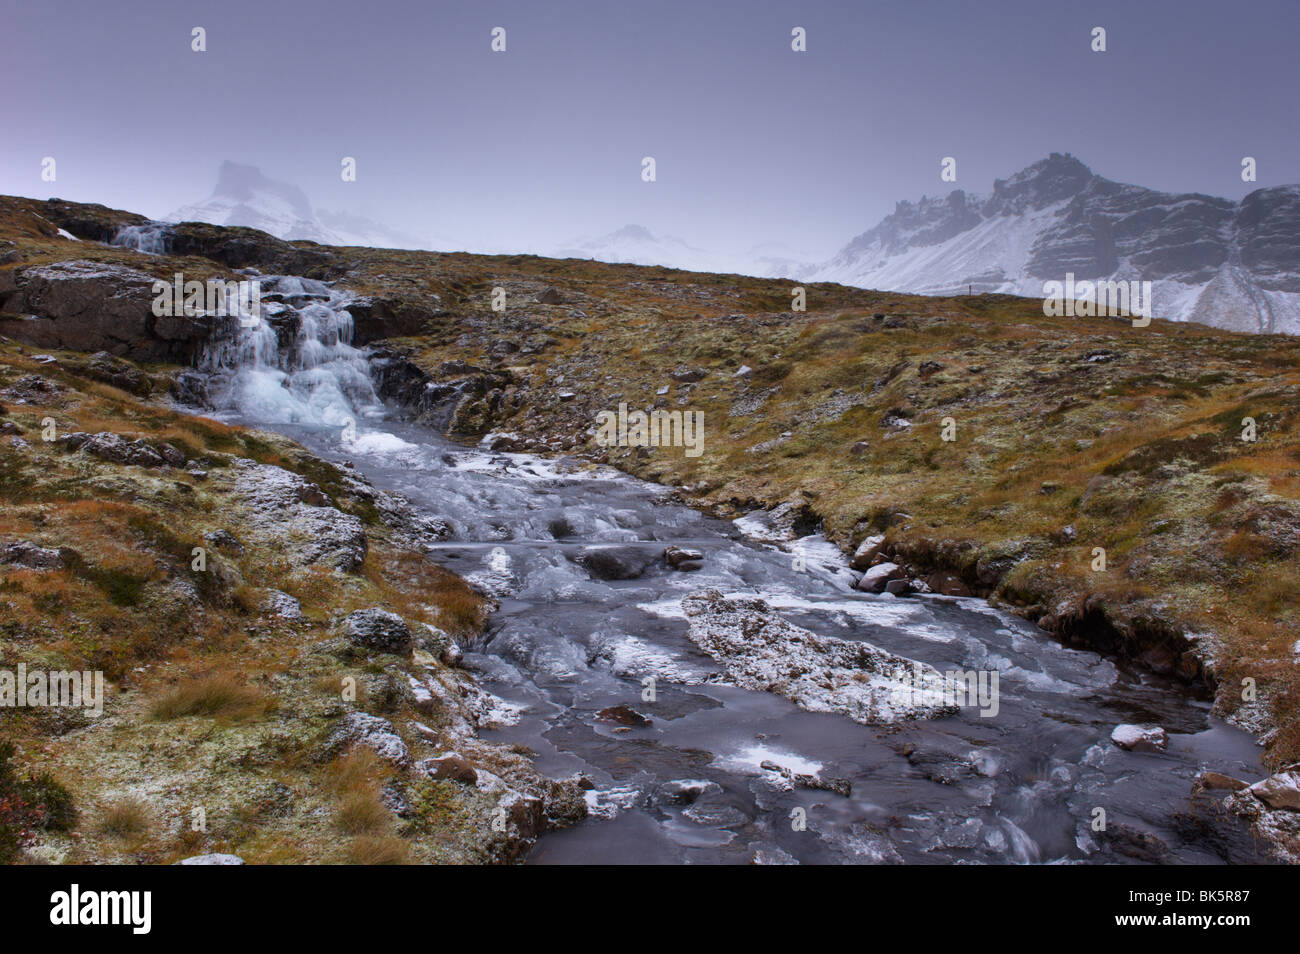 Frozen waterfall and stream in the East Fjords, near Neskaupstadur, Nordfjordur-Reydarfjordur, East Fjords, Iceland - Stock Image